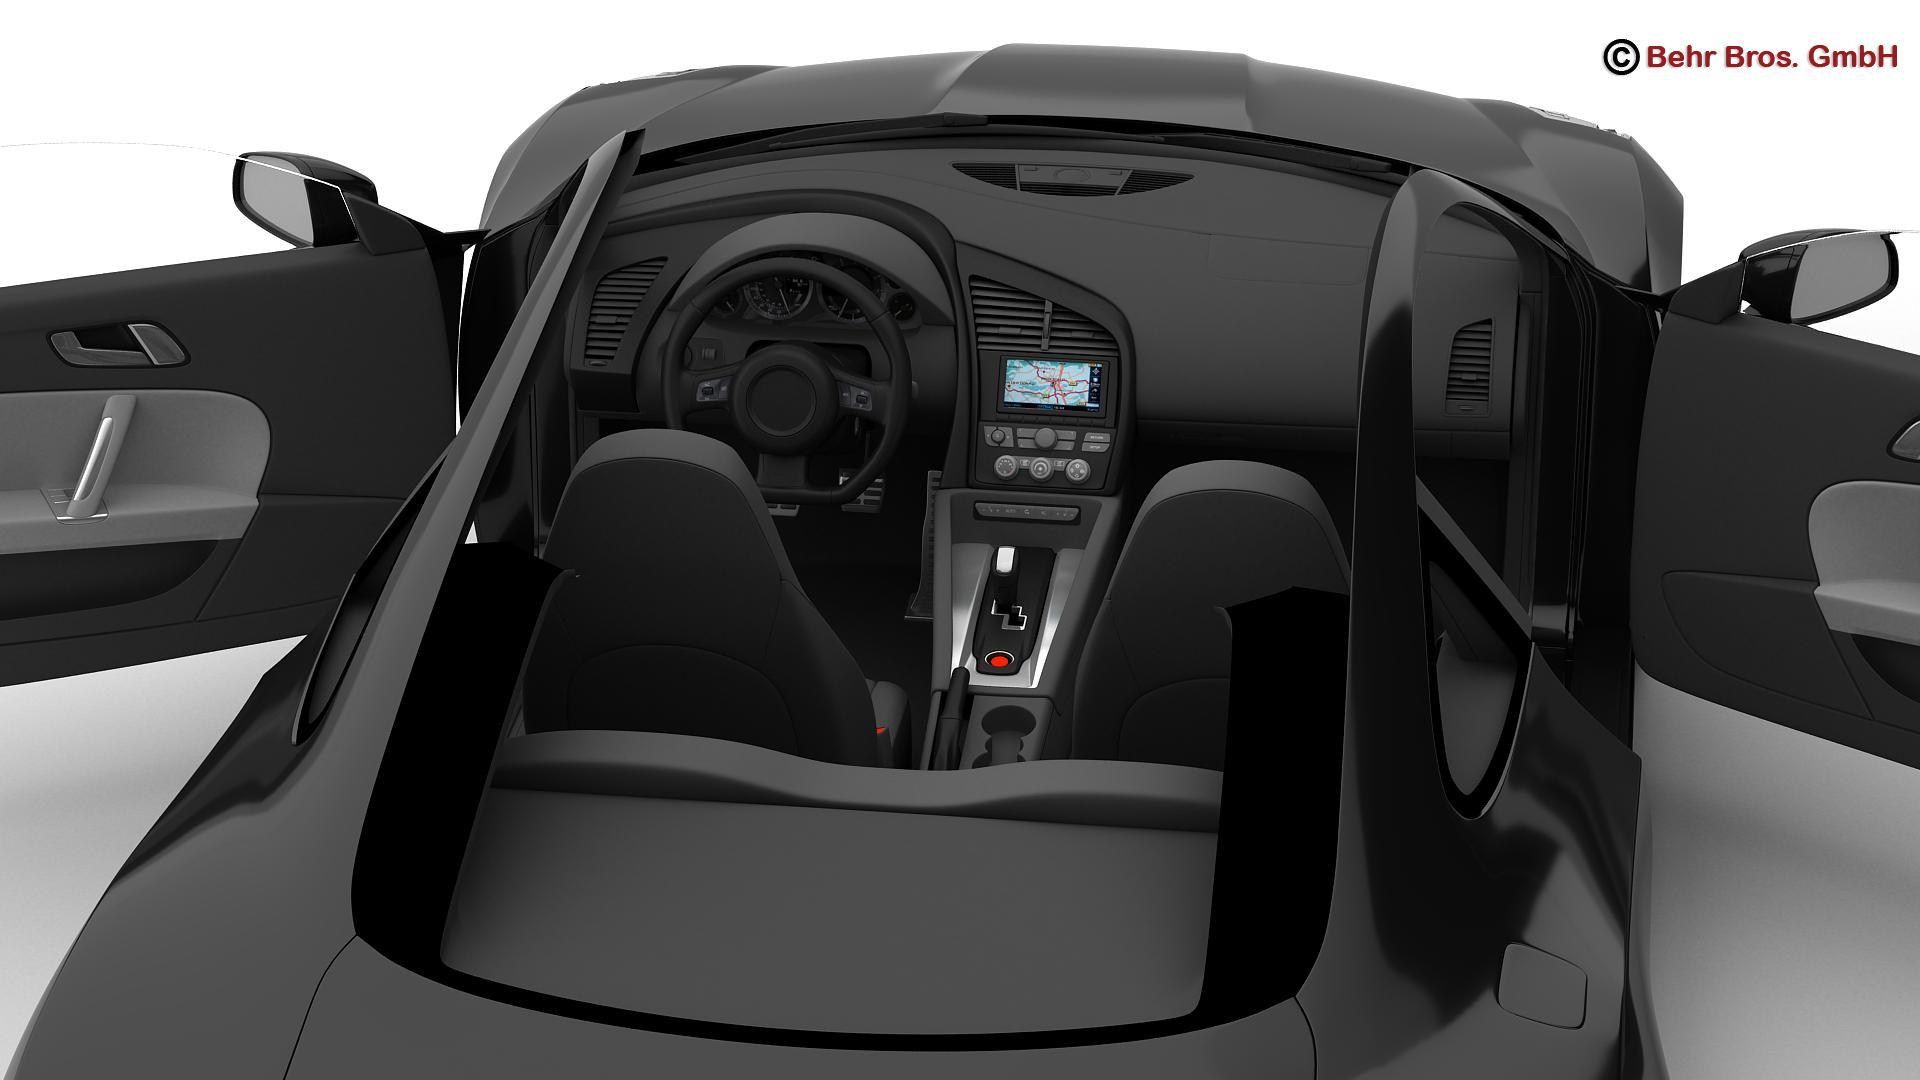 generic sports car 3d model 3ds max fbx c4d lwo ma mb obj 160533